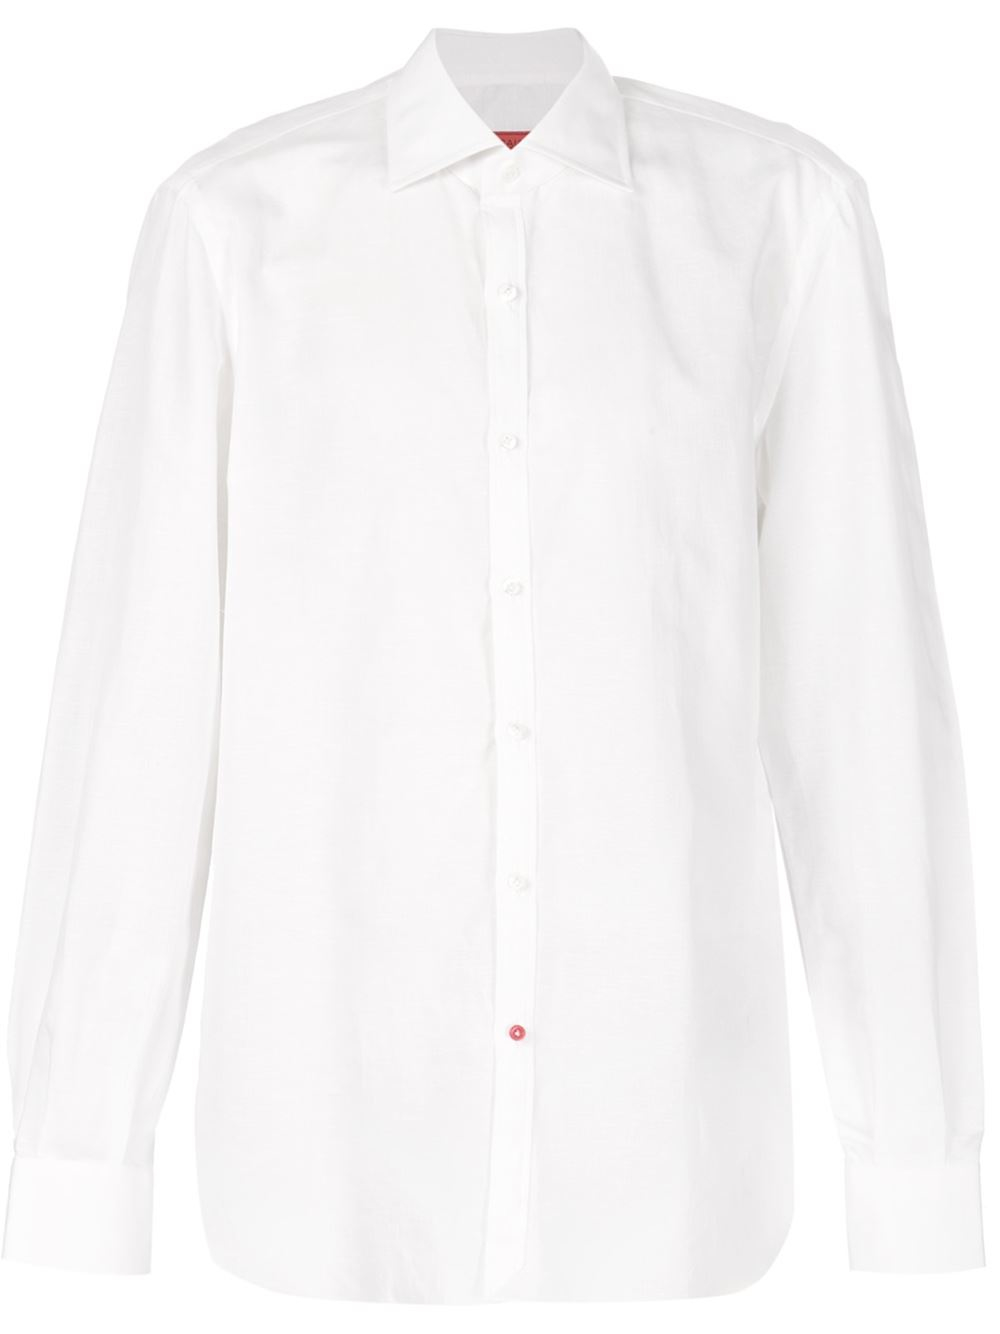 Isaia cutaway collar shirt in white for men lyst for White cutaway collar shirt